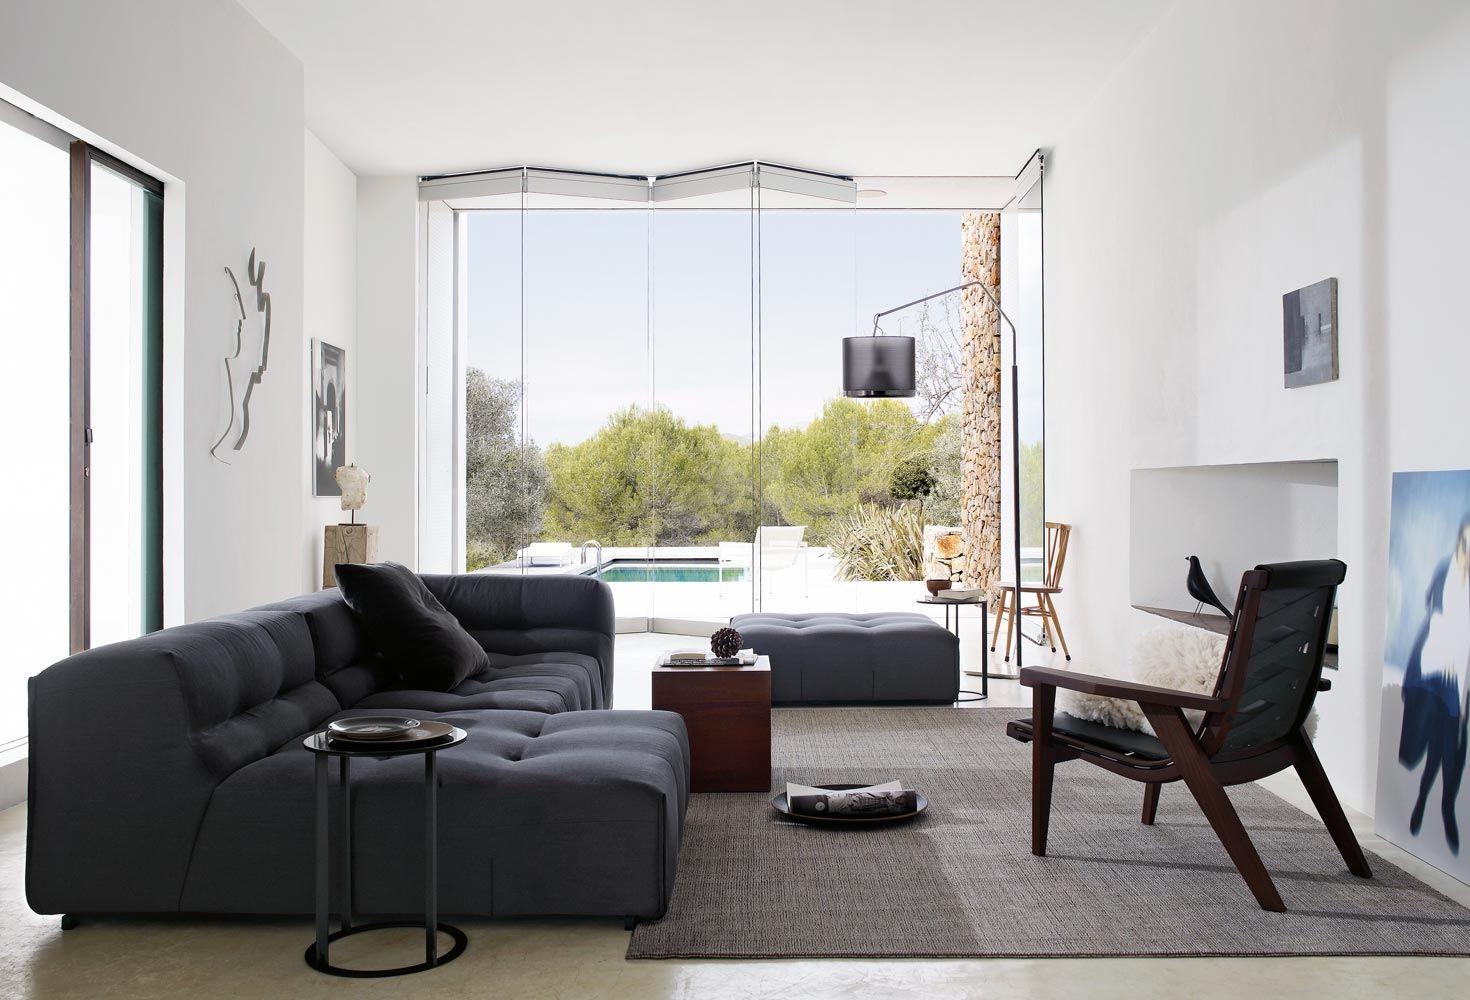 Living room living room interior design ideas with blue sofa and